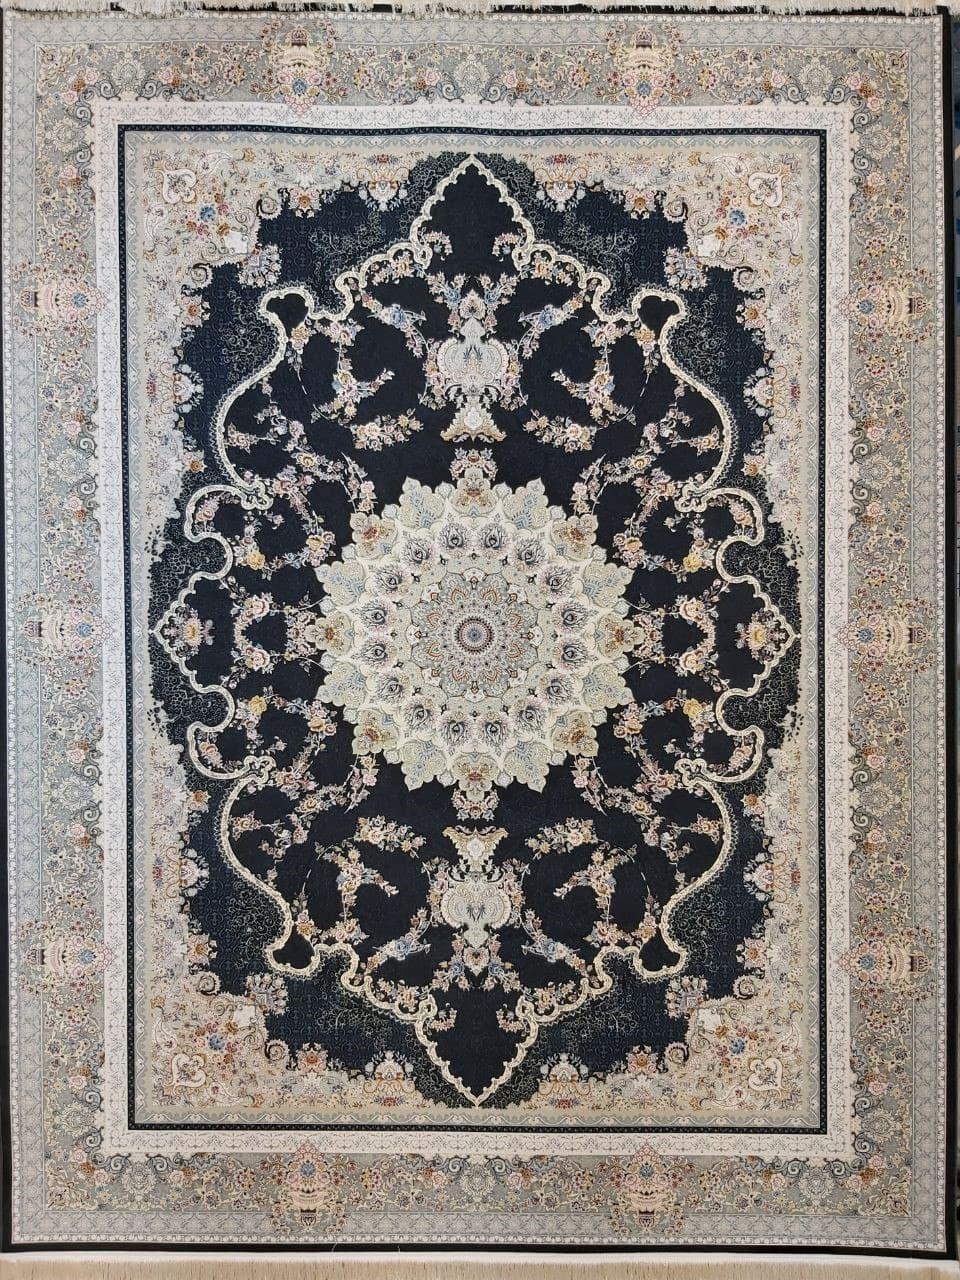 فرش 1500 شانه گل برجسته نقشه صدف زمینه ذغالی